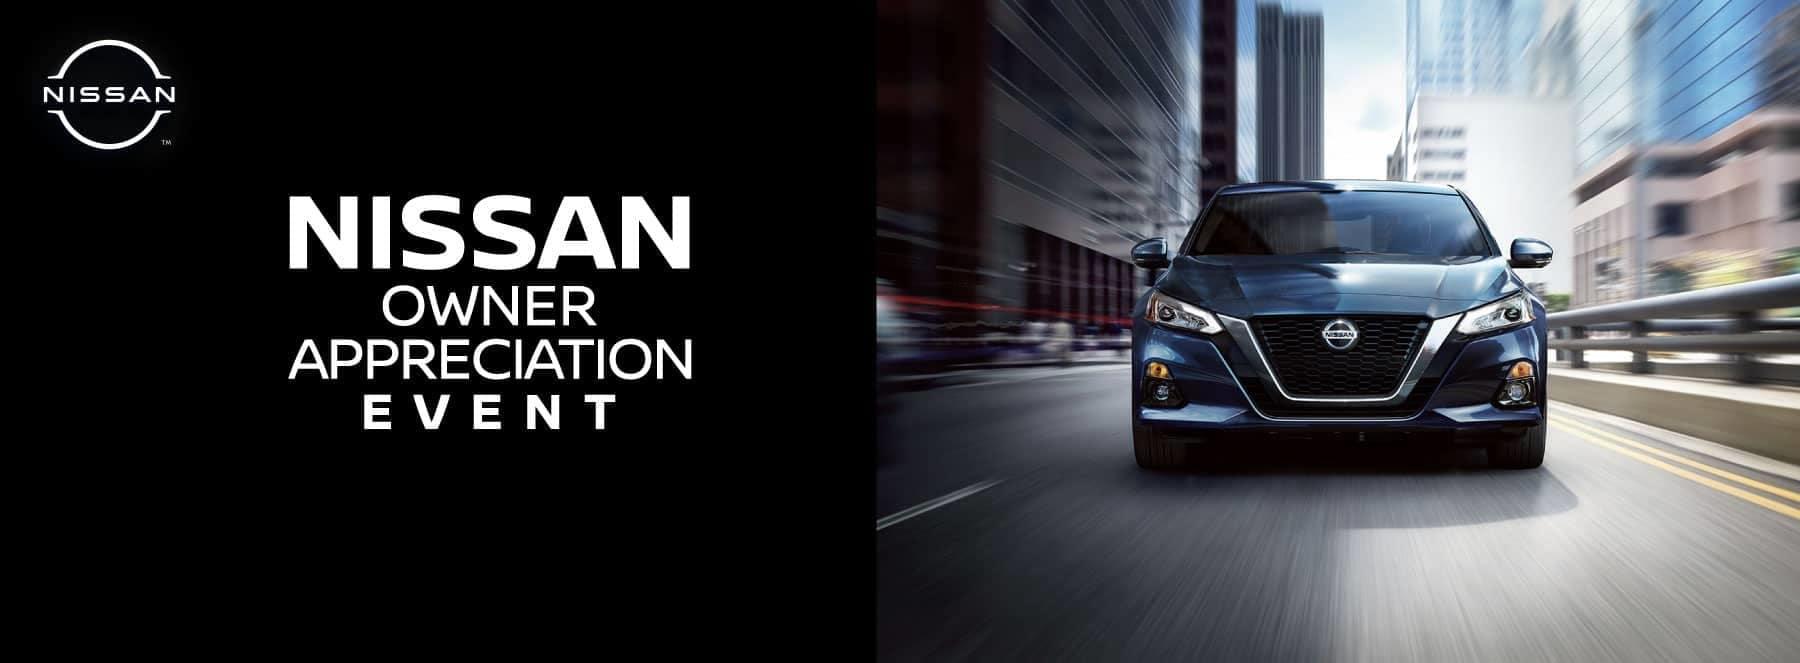 Nissan_Owner_Appreciation_EventDI